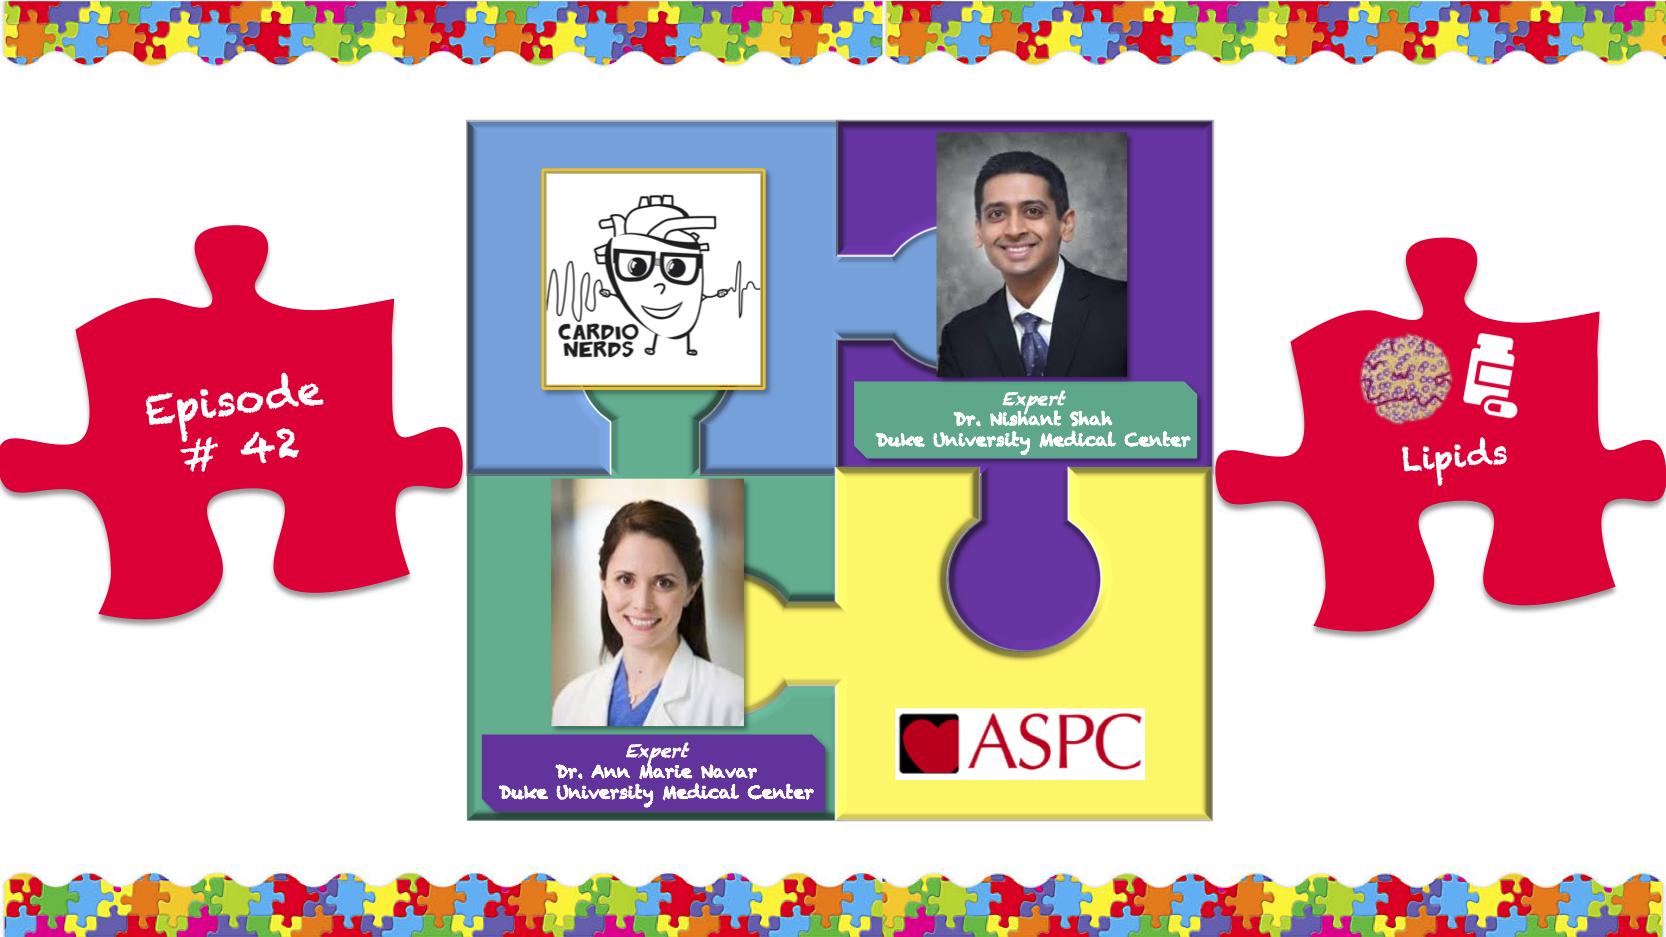 42. Lipid Management with Drs. Ann Marie Navar & Nishant Shah